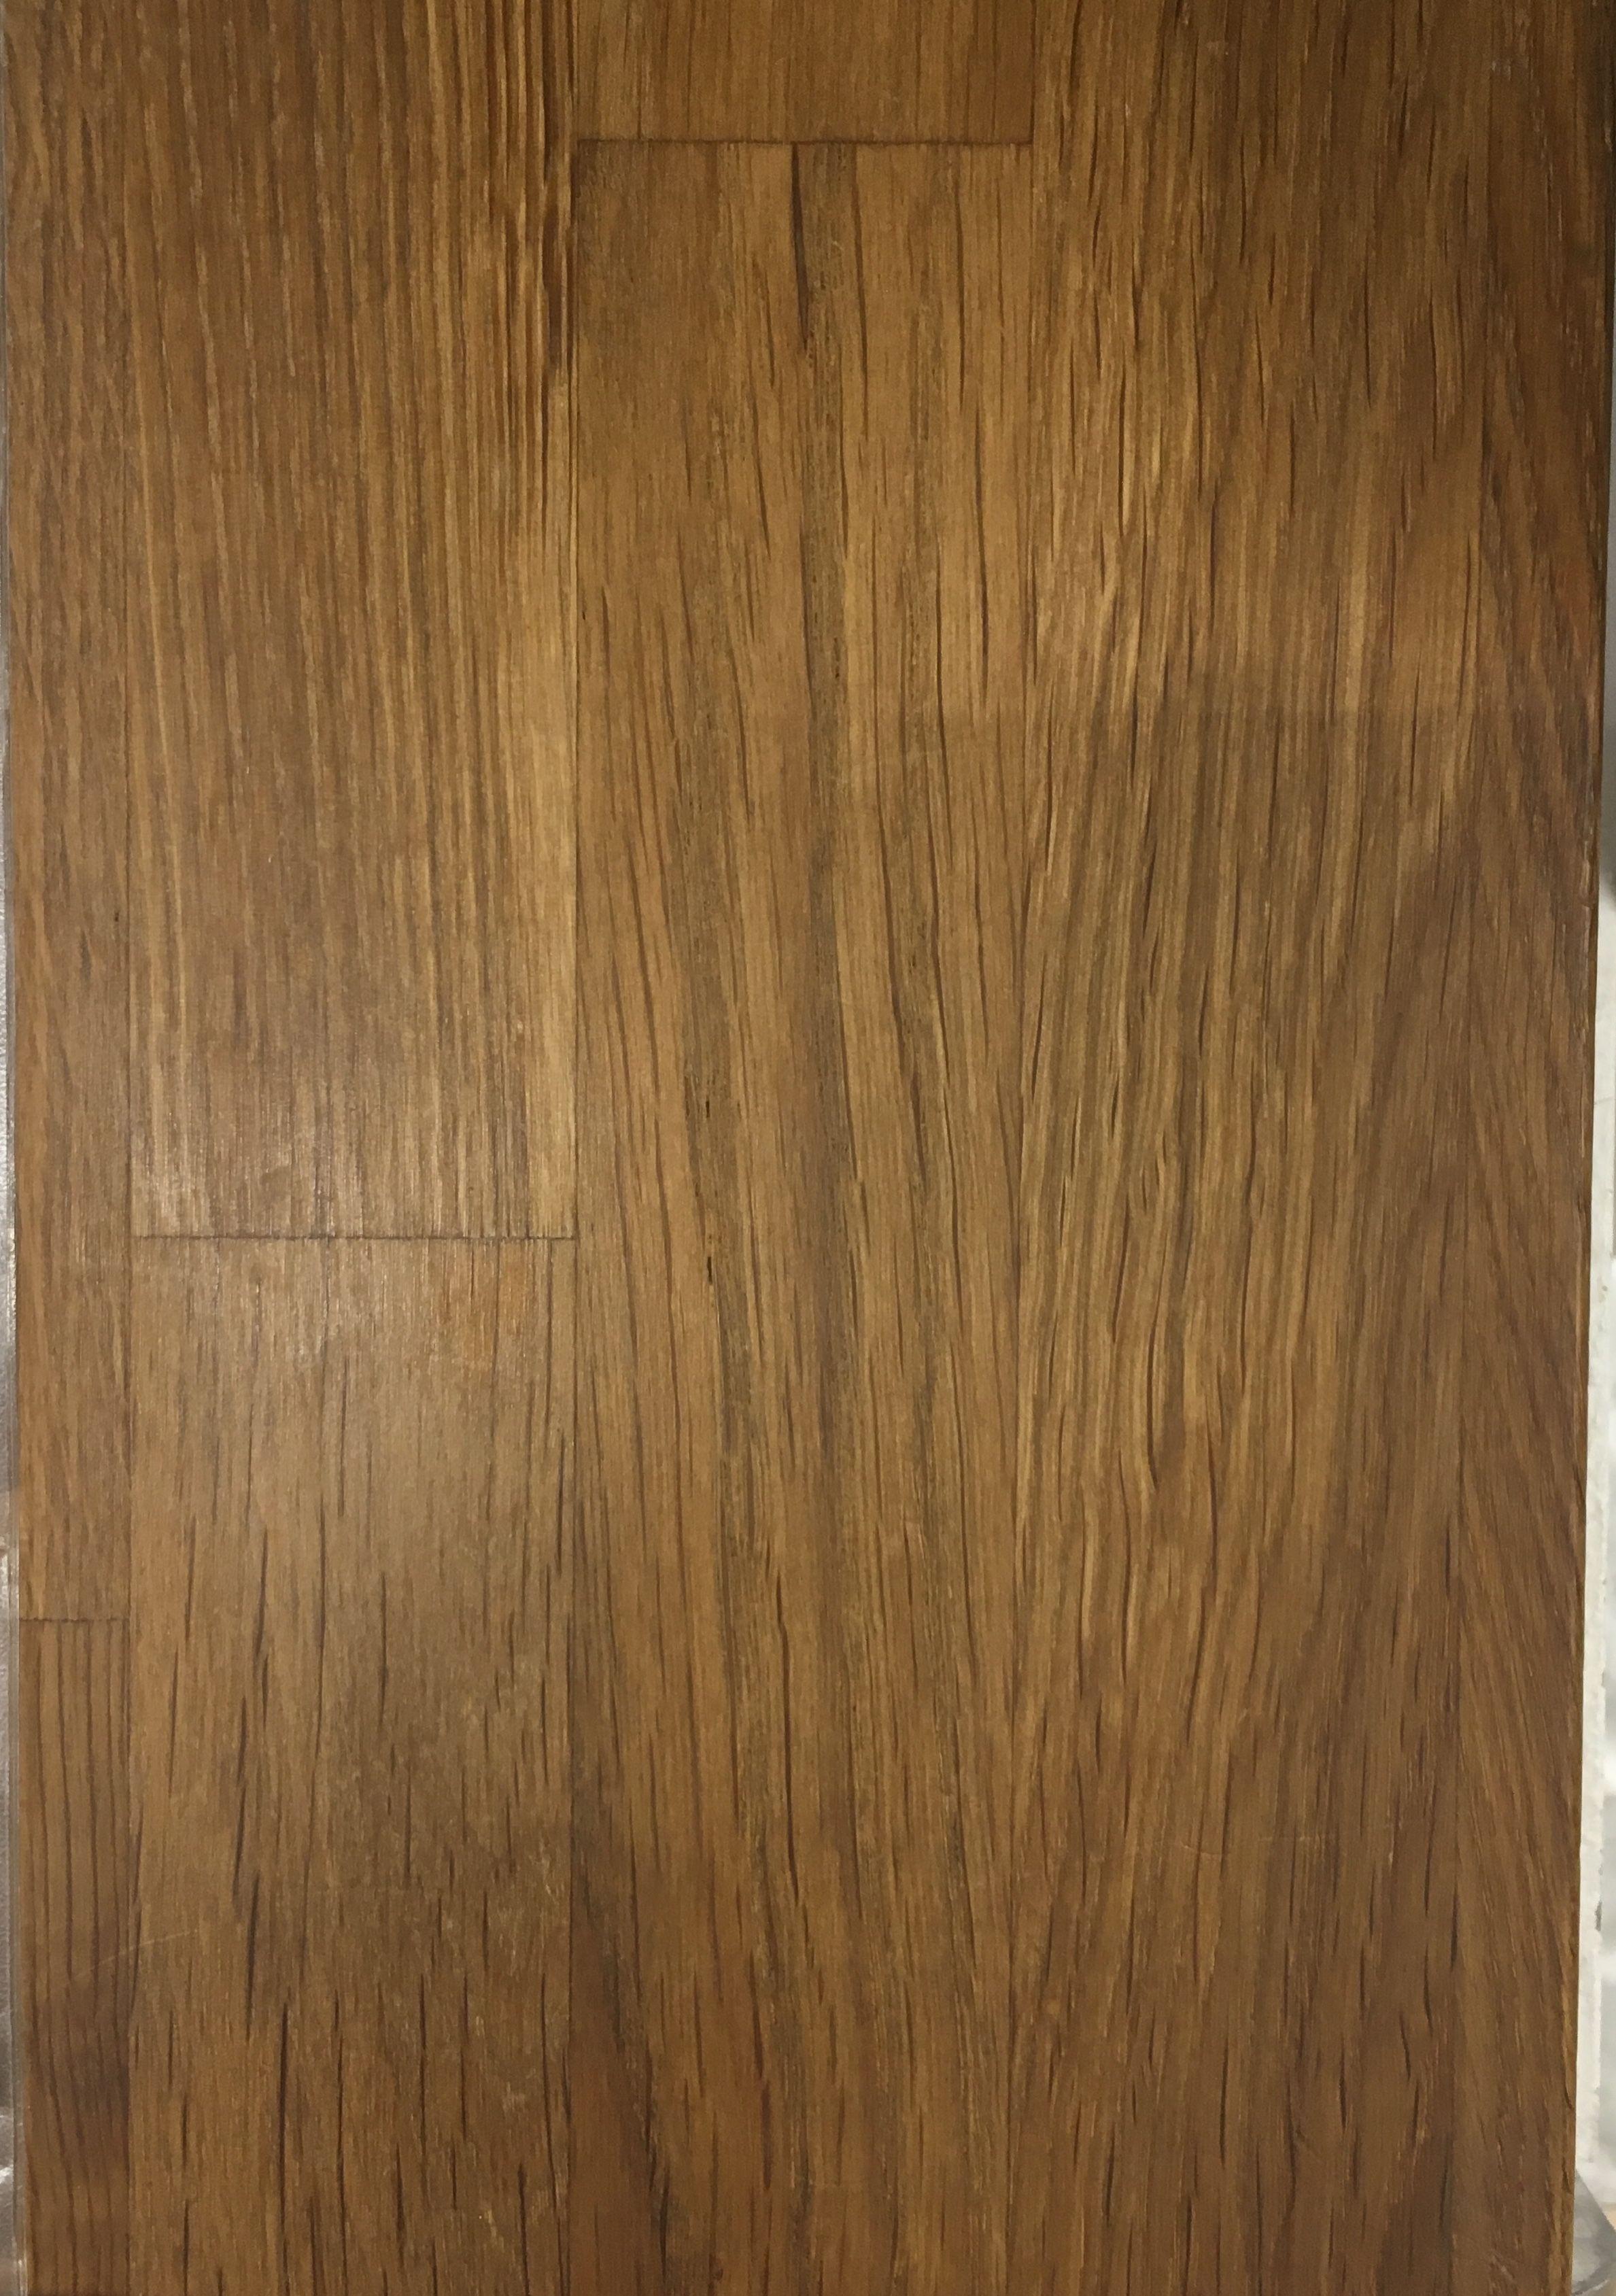 Murrieta Flooring Experts Carpet Hardwood And More Flooring Wood Porcelain Tile